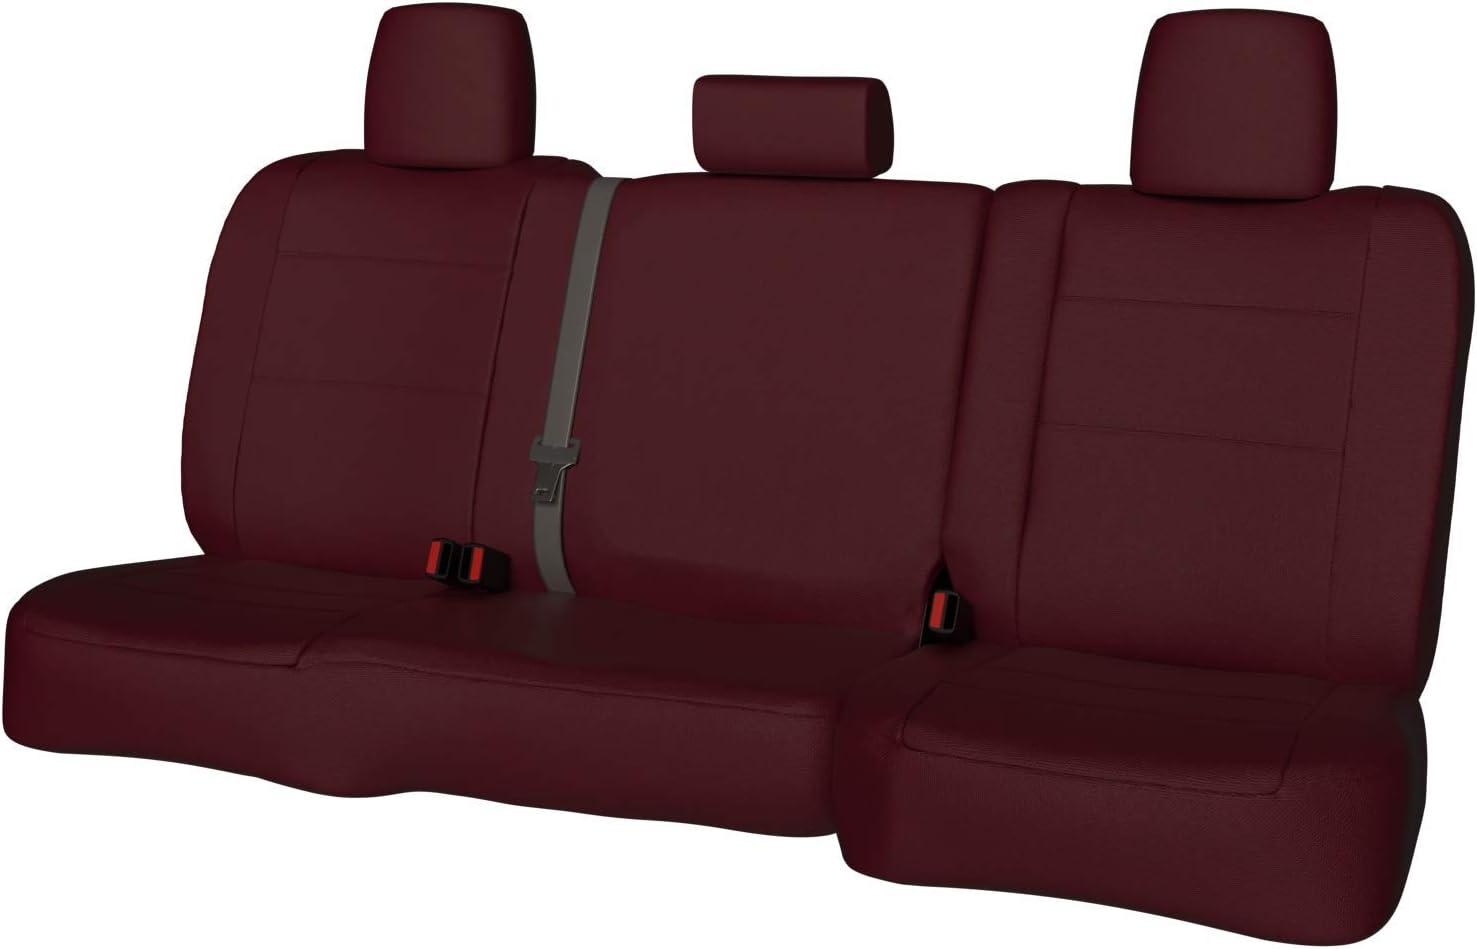 Rear SEAT: ShearComfort Custom Waterproof Covers fo Popular overseas Seat Limited Special Price Cordura